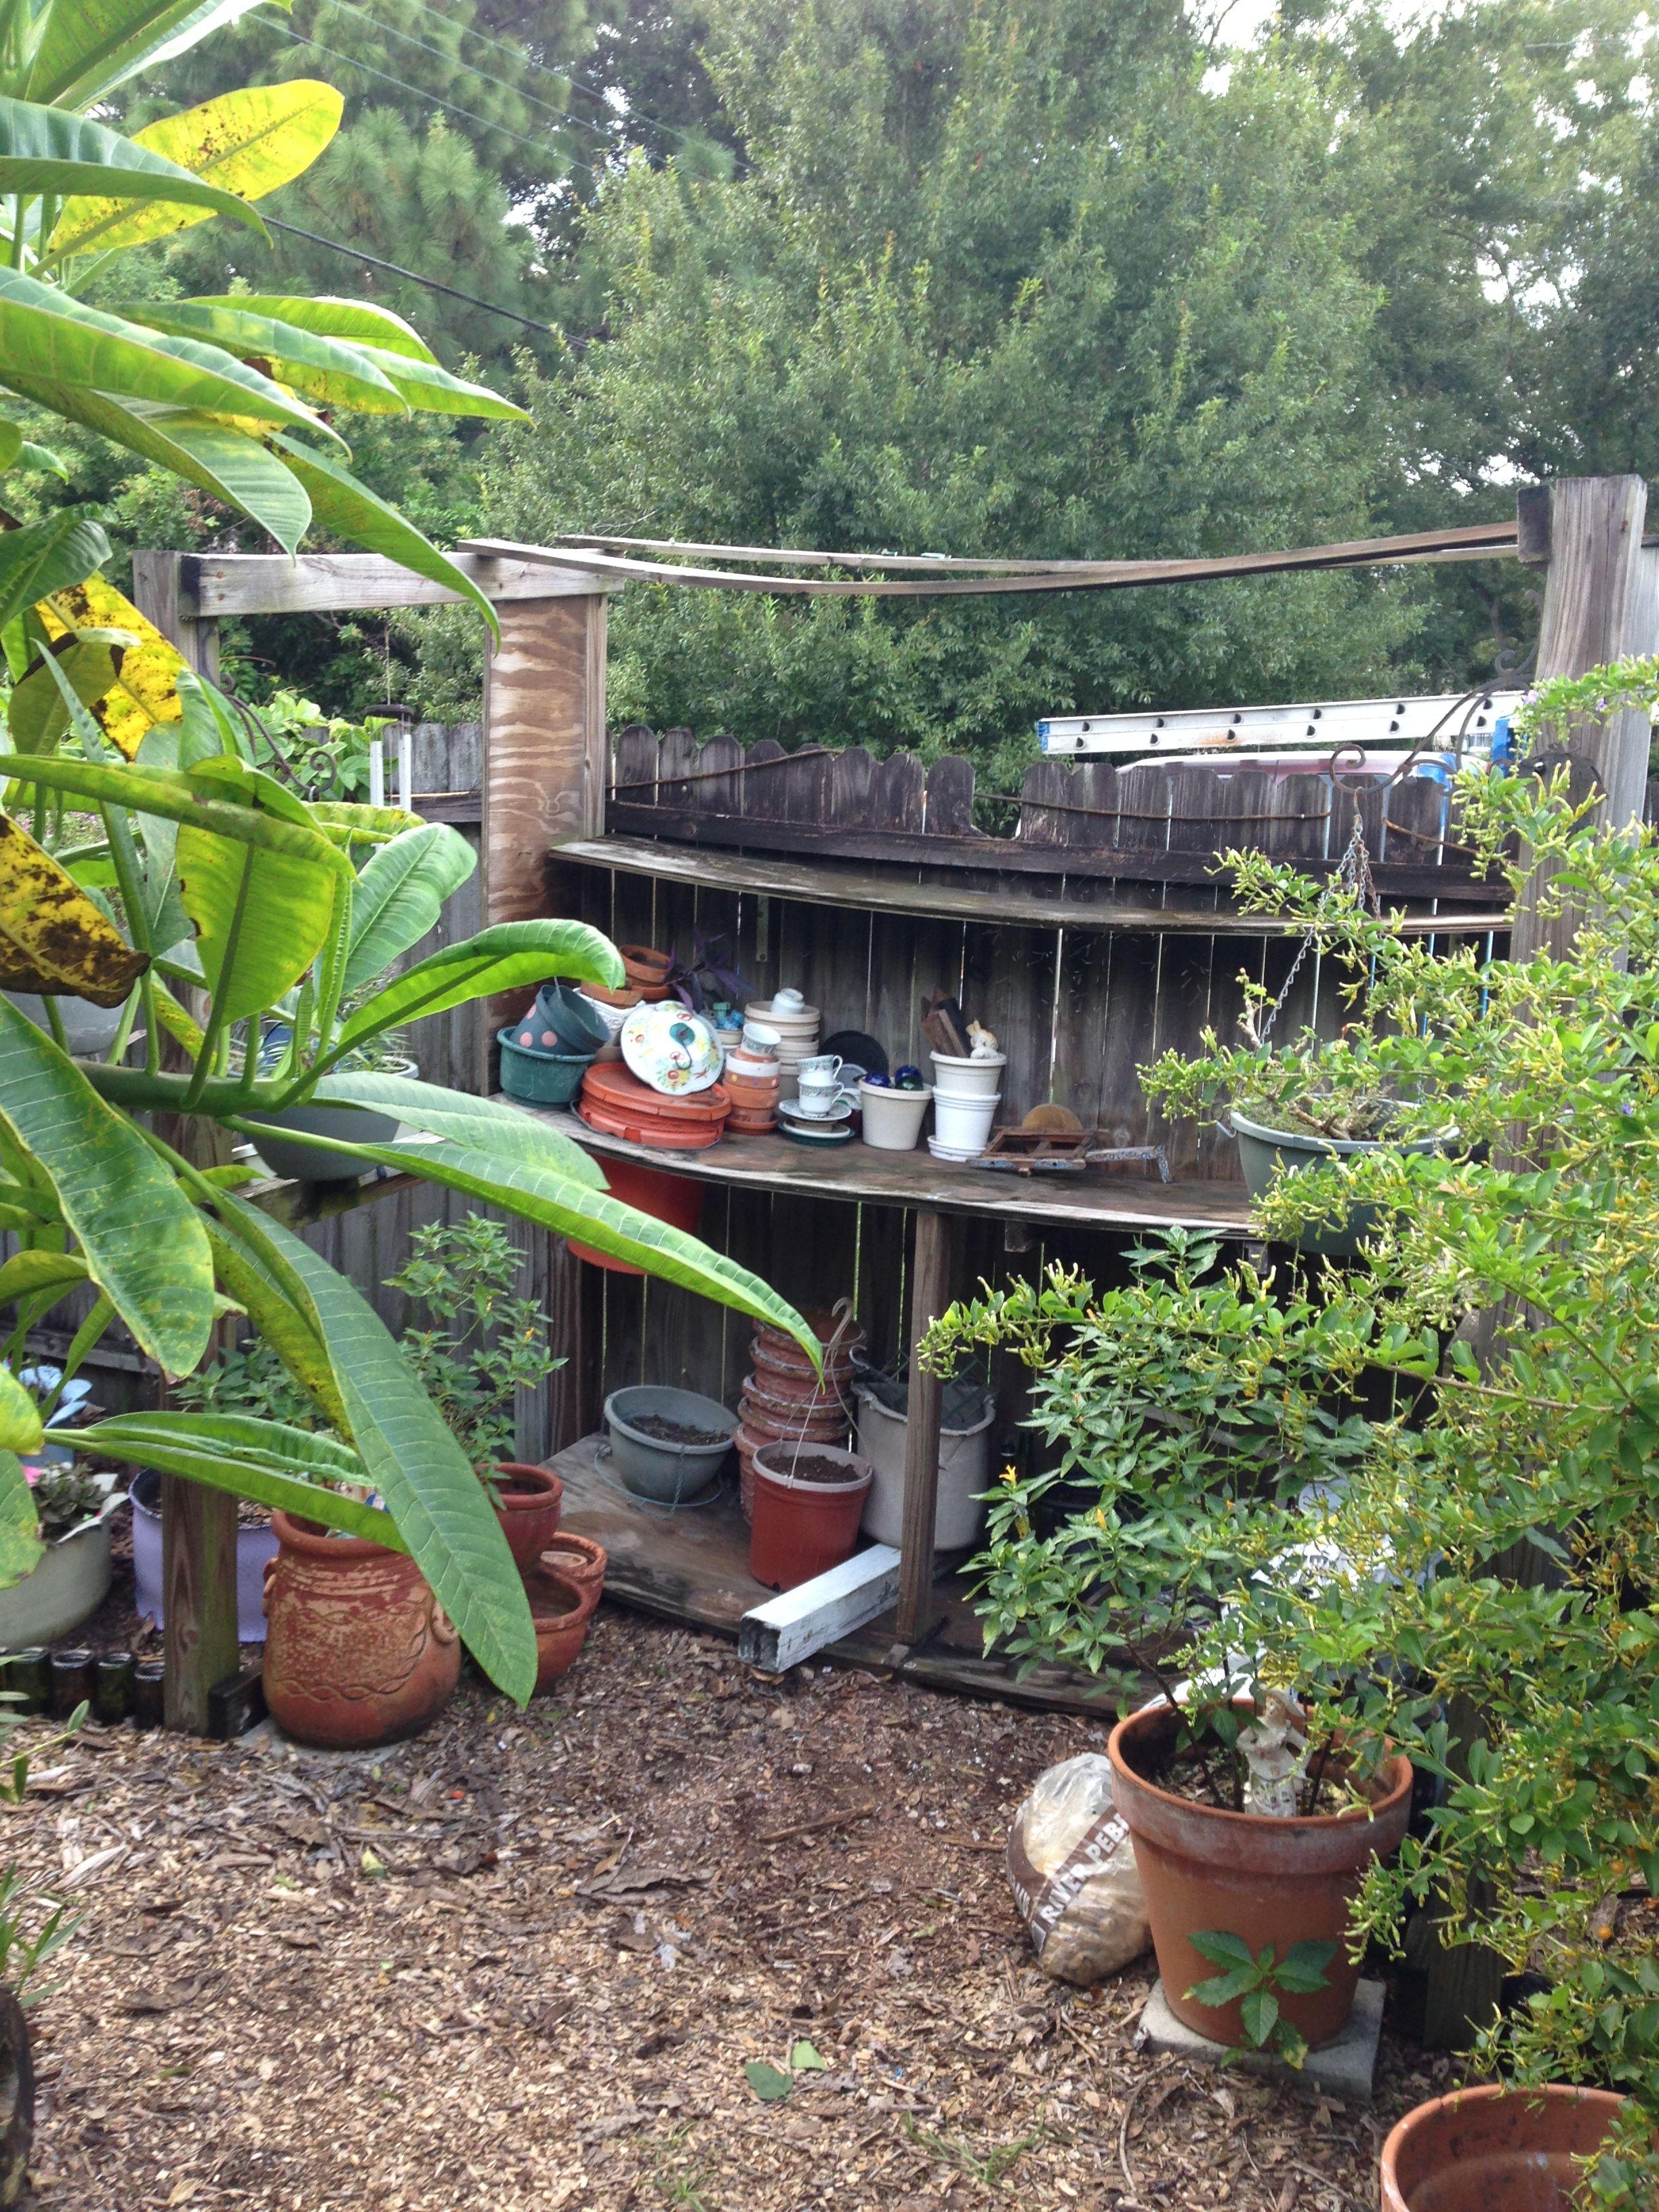 Pin by Crespo on Yard Yard, Plants